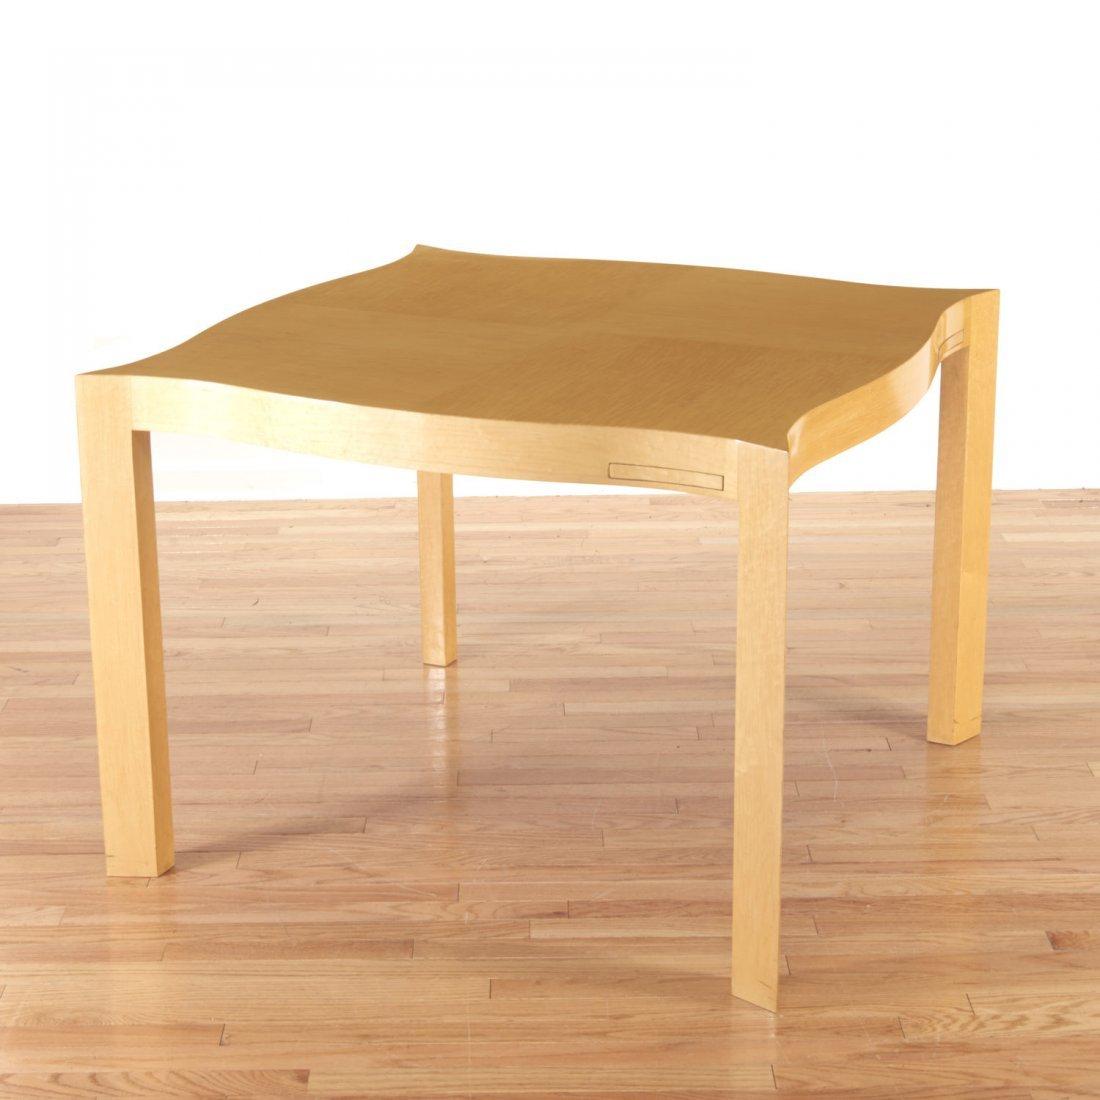 Designer shaped blonde wood bridge table - 5